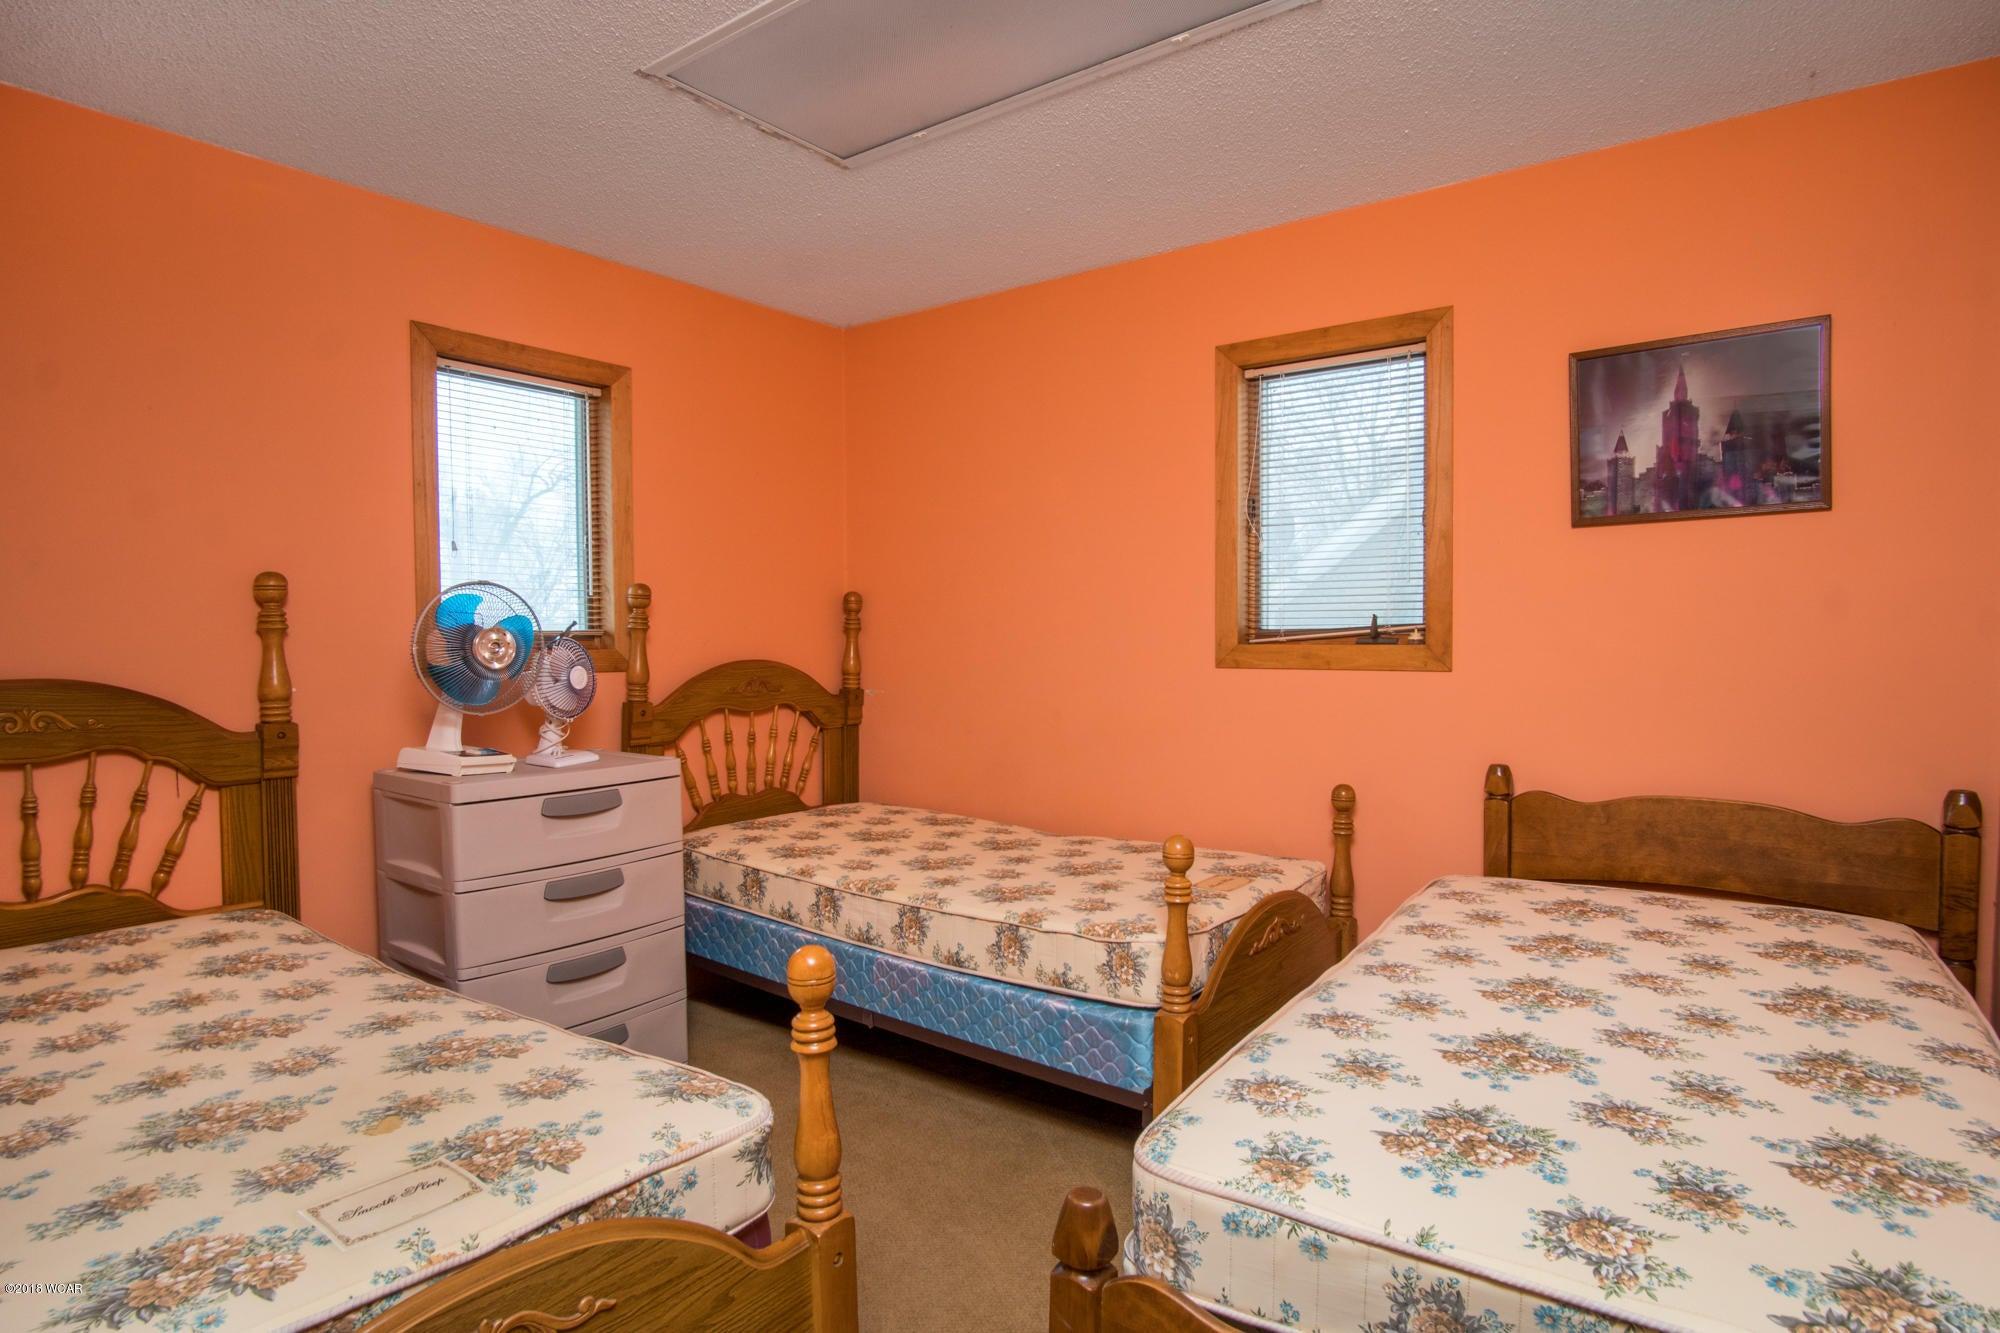 11800 Indian Beach Road,Spicer,2 Bedrooms Bedrooms,1 BathroomBathrooms,Single Family,Indian Beach Road,6030174